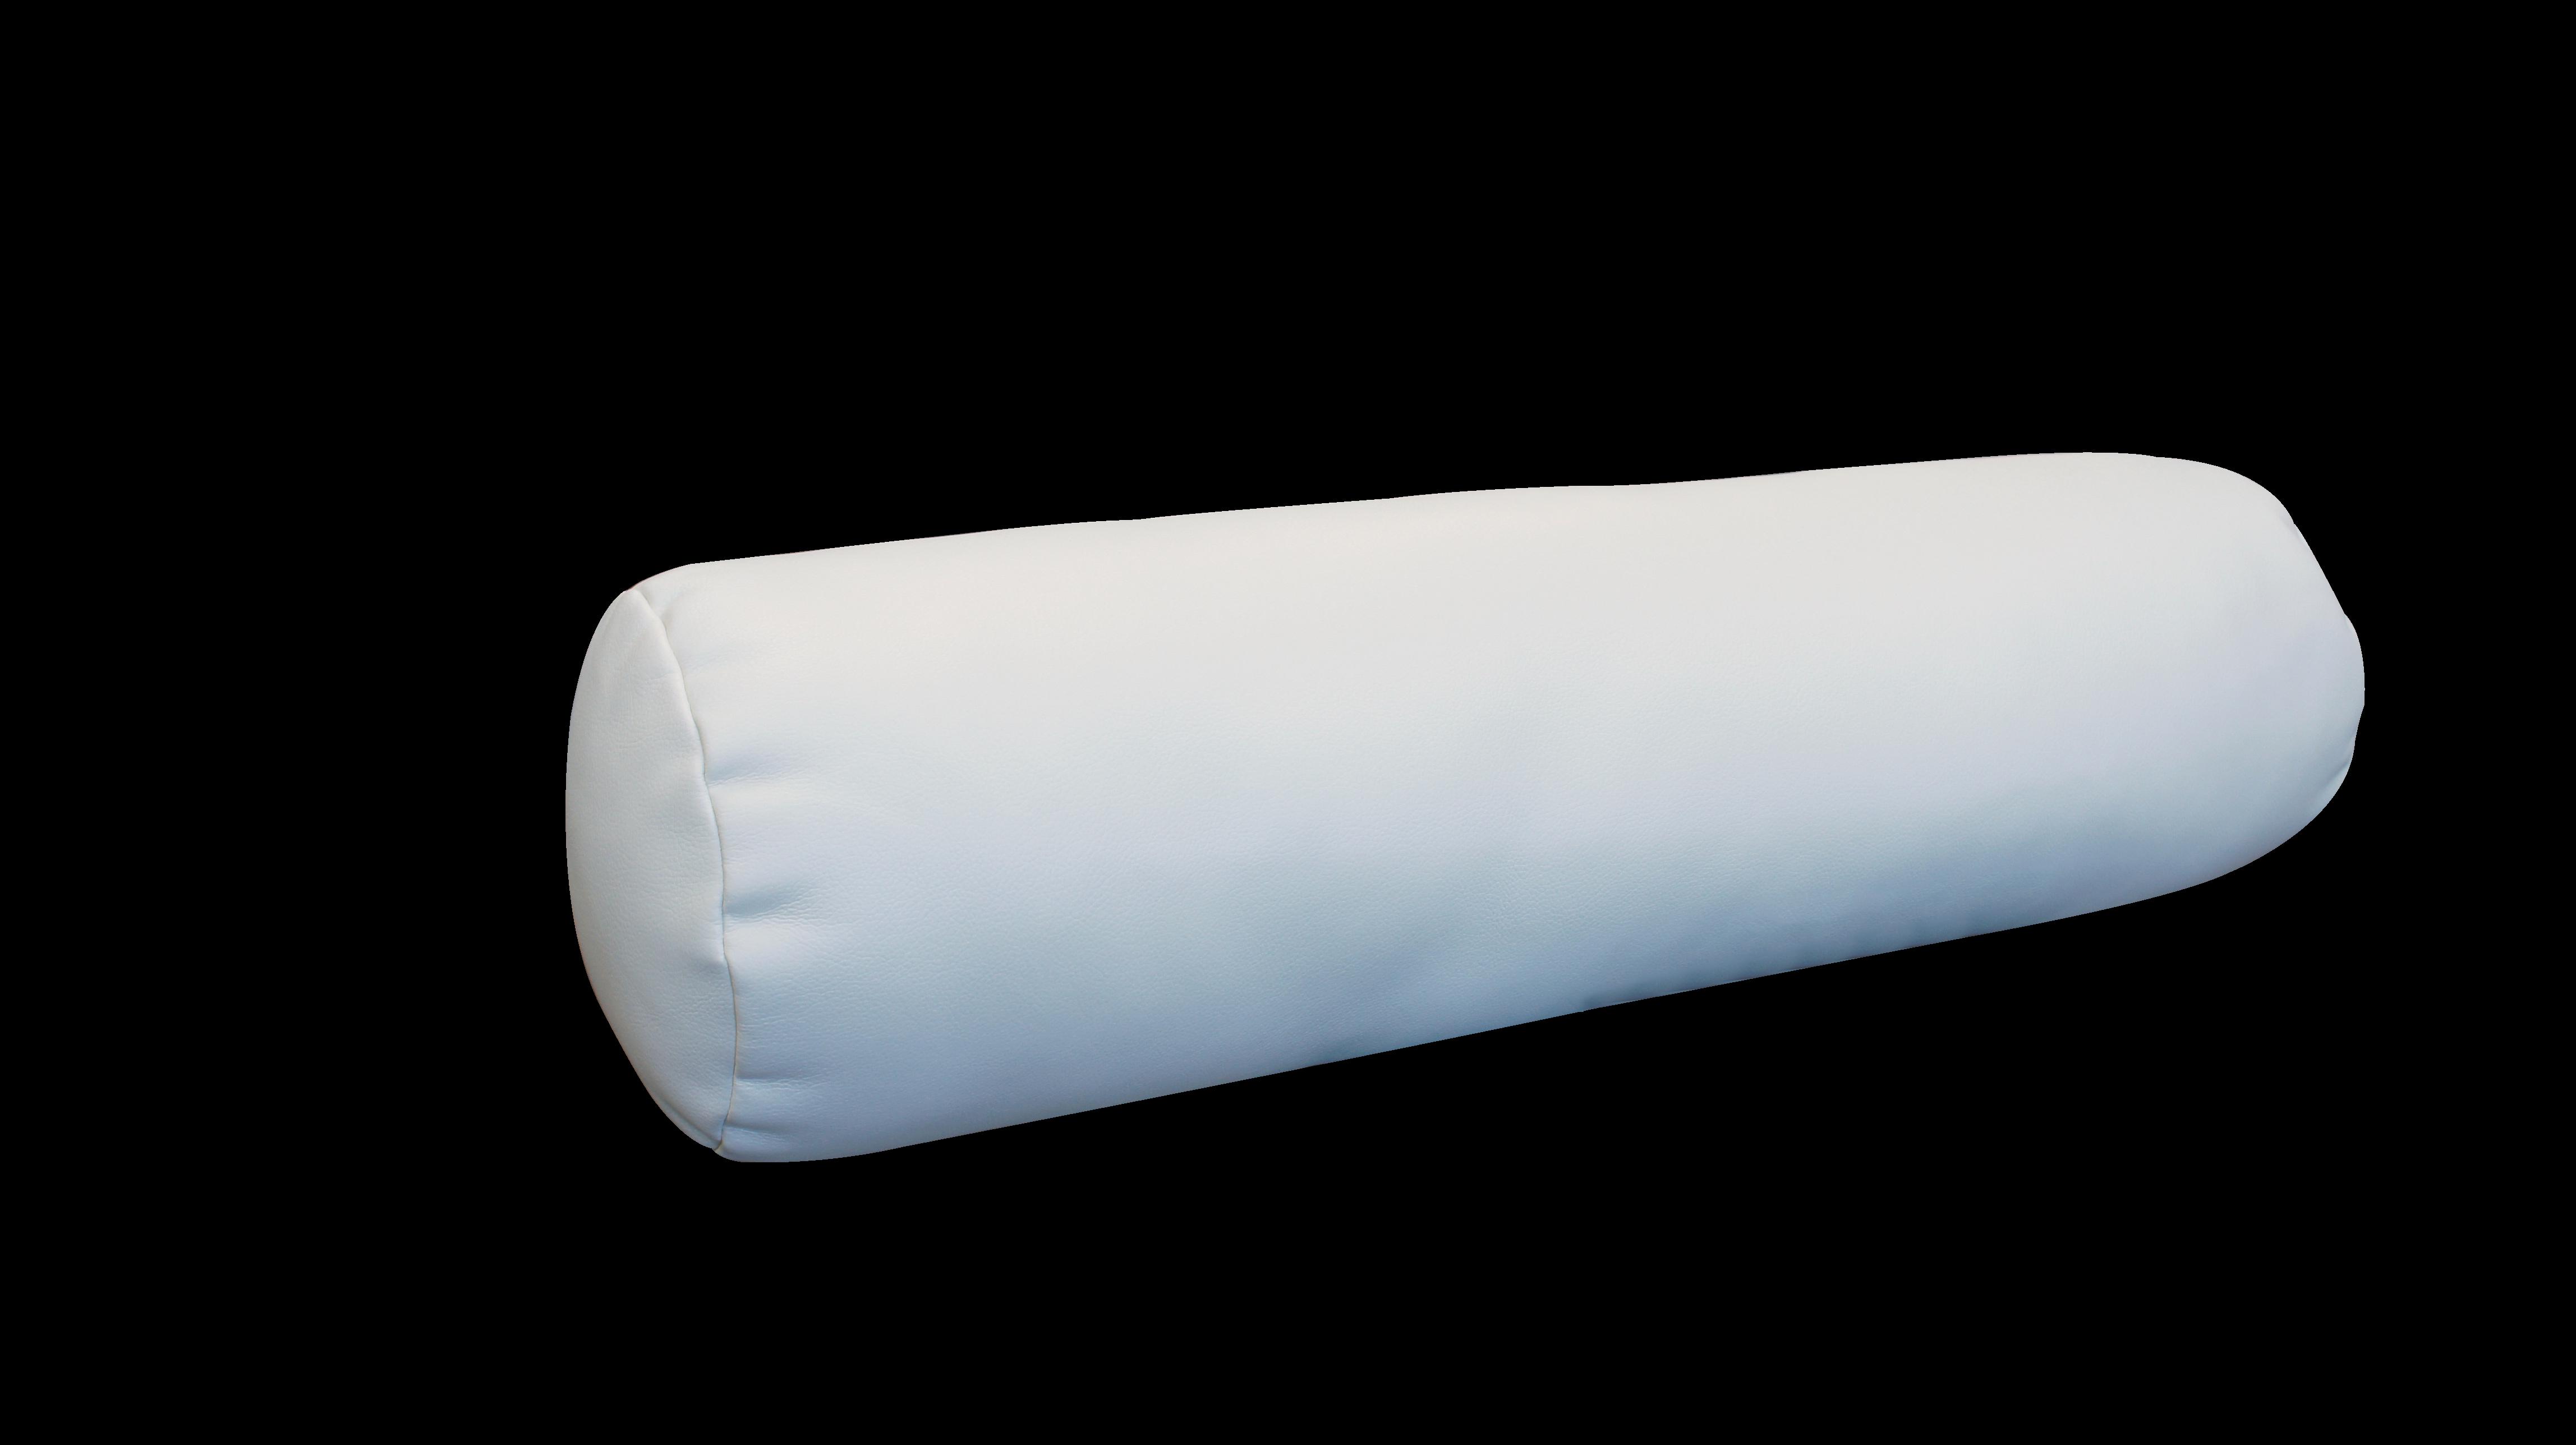 8 Quot Full Round Bolster Pillow Cushion Jumbo Size Massage